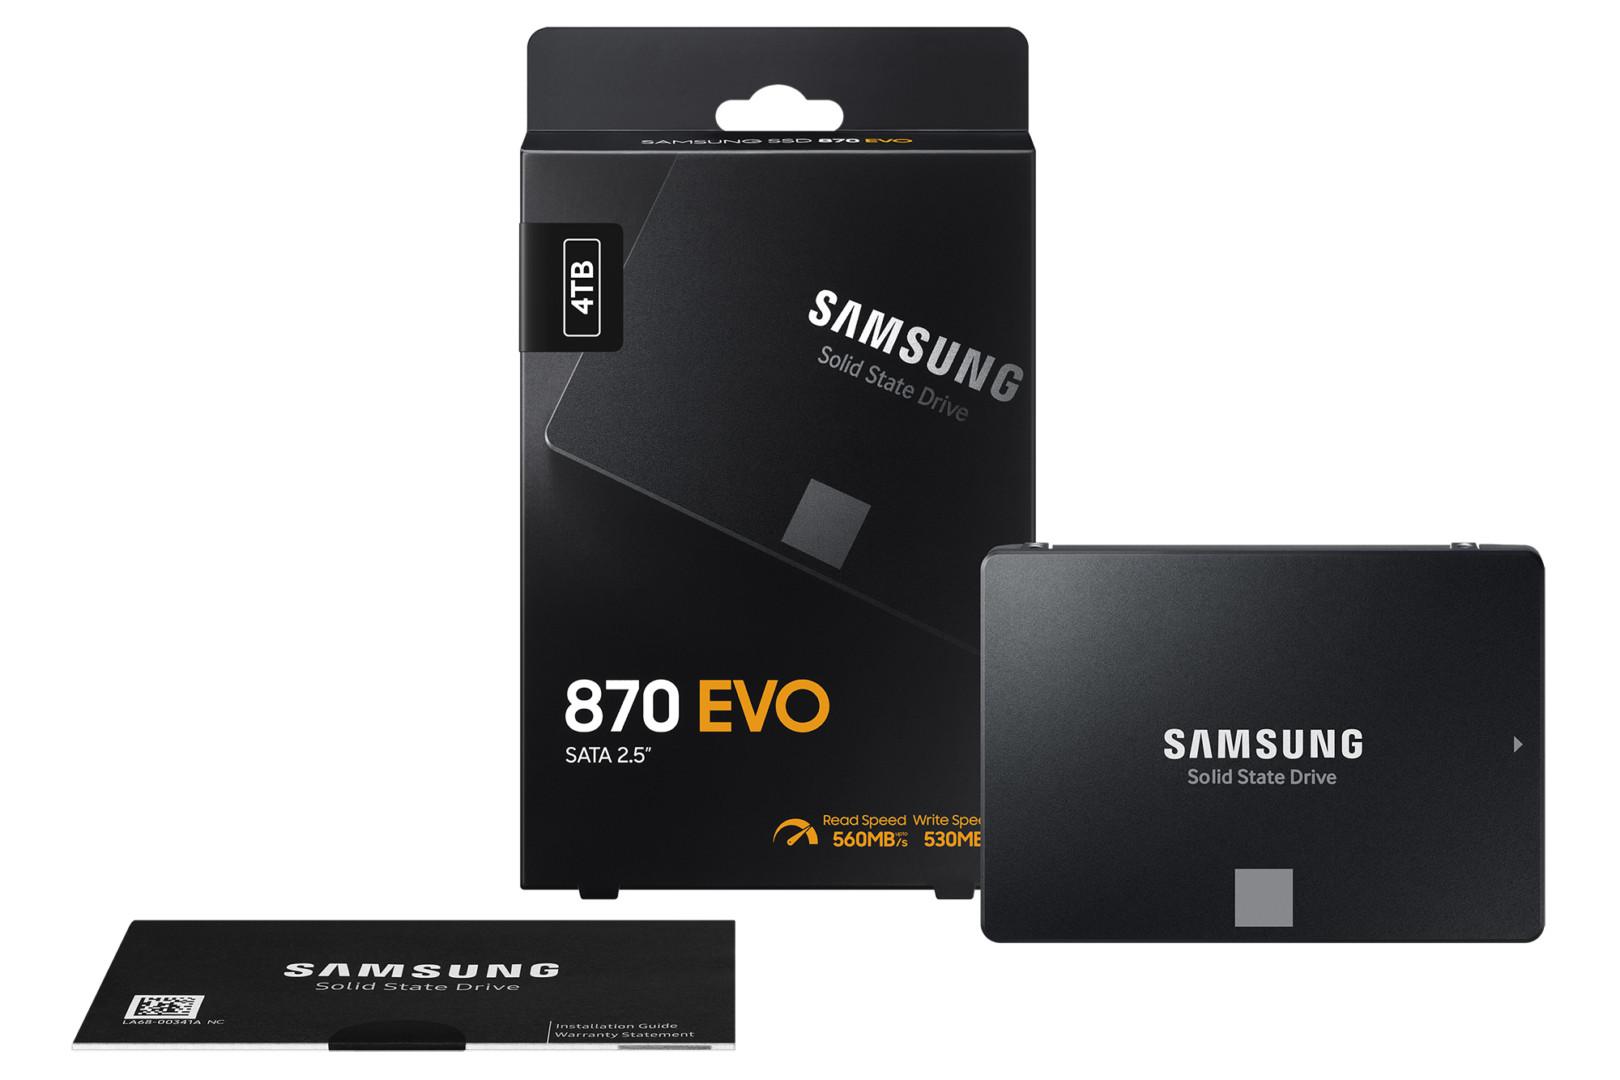 Samsung 870 Evo Sata Ssd Cover